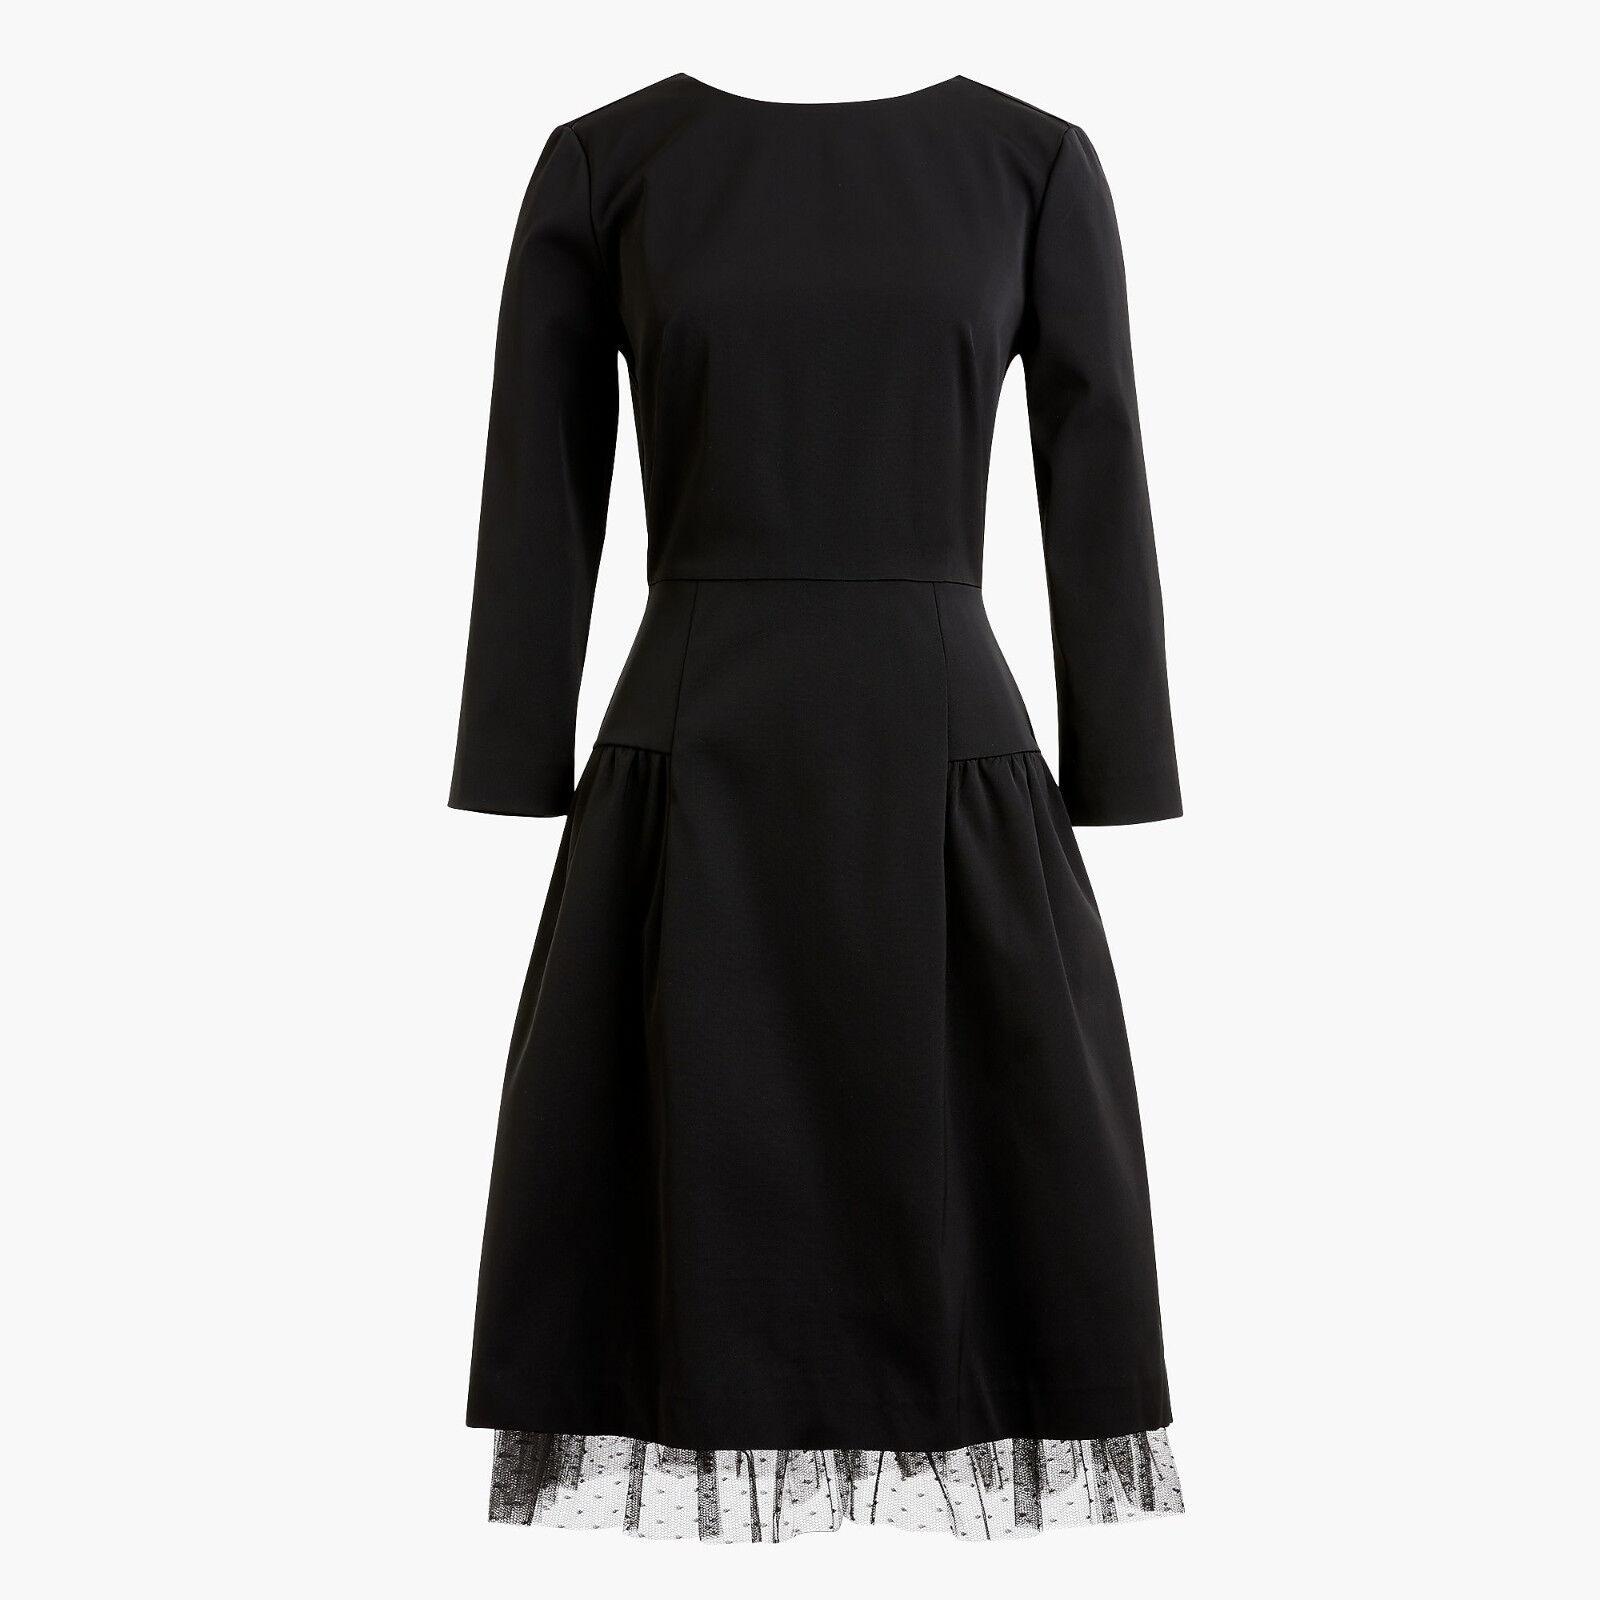 J.Crew Long Sleeve Sheath Dress With Tulle Hem schwarz Größe 0  H2851 - NWT